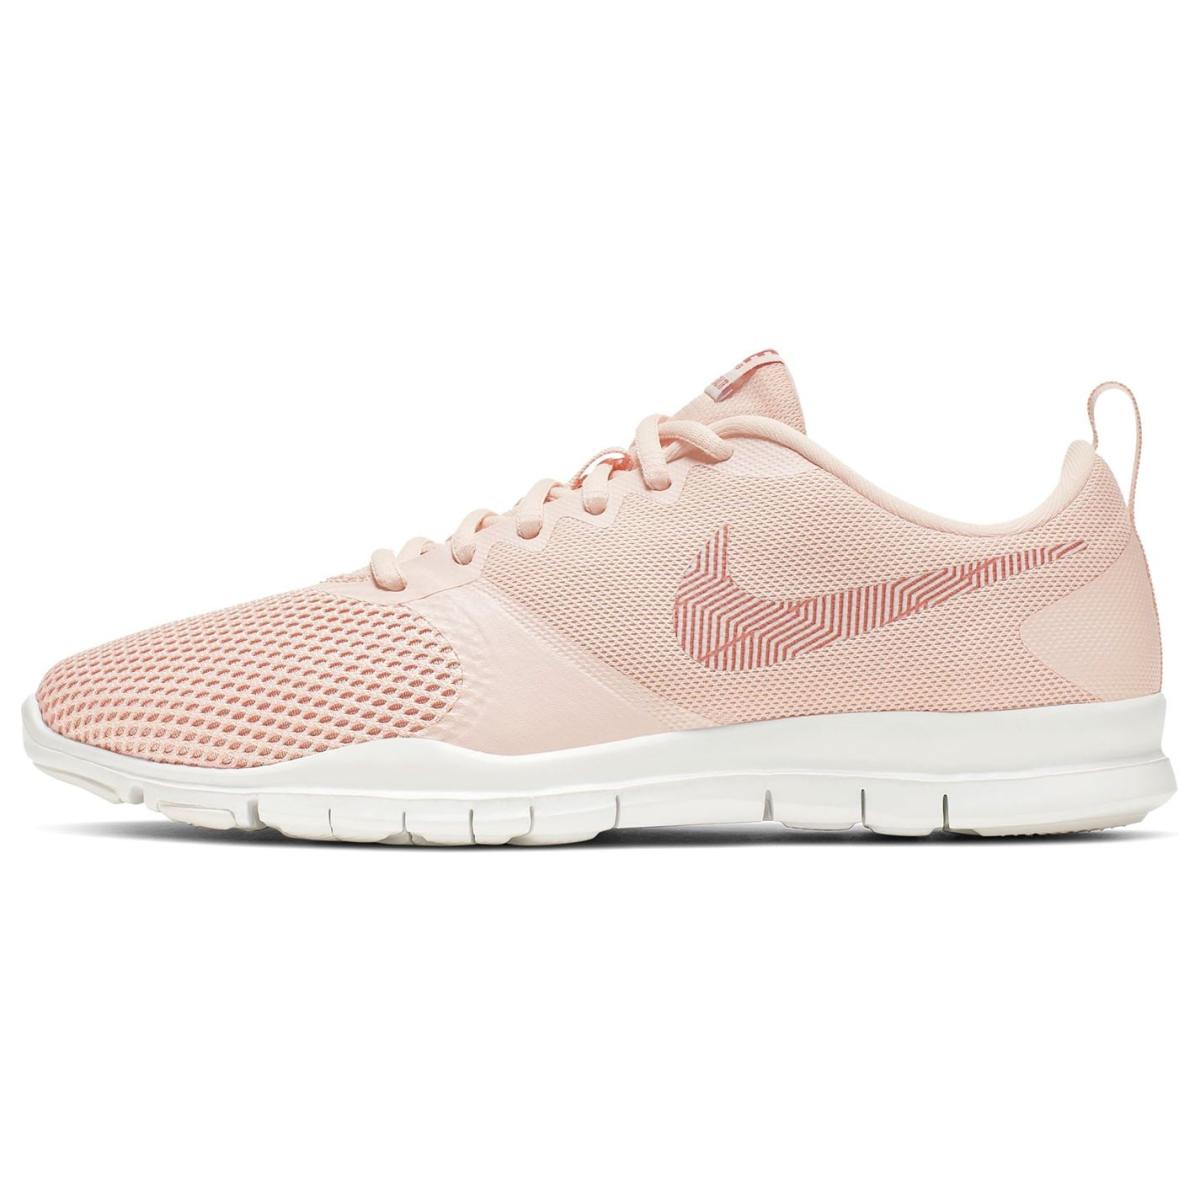 Nike-Flex-Laufschuhe-Turnschuhe-Damen-Sneaker-Sportschuhe-Jogging-3088 Indexbild 19